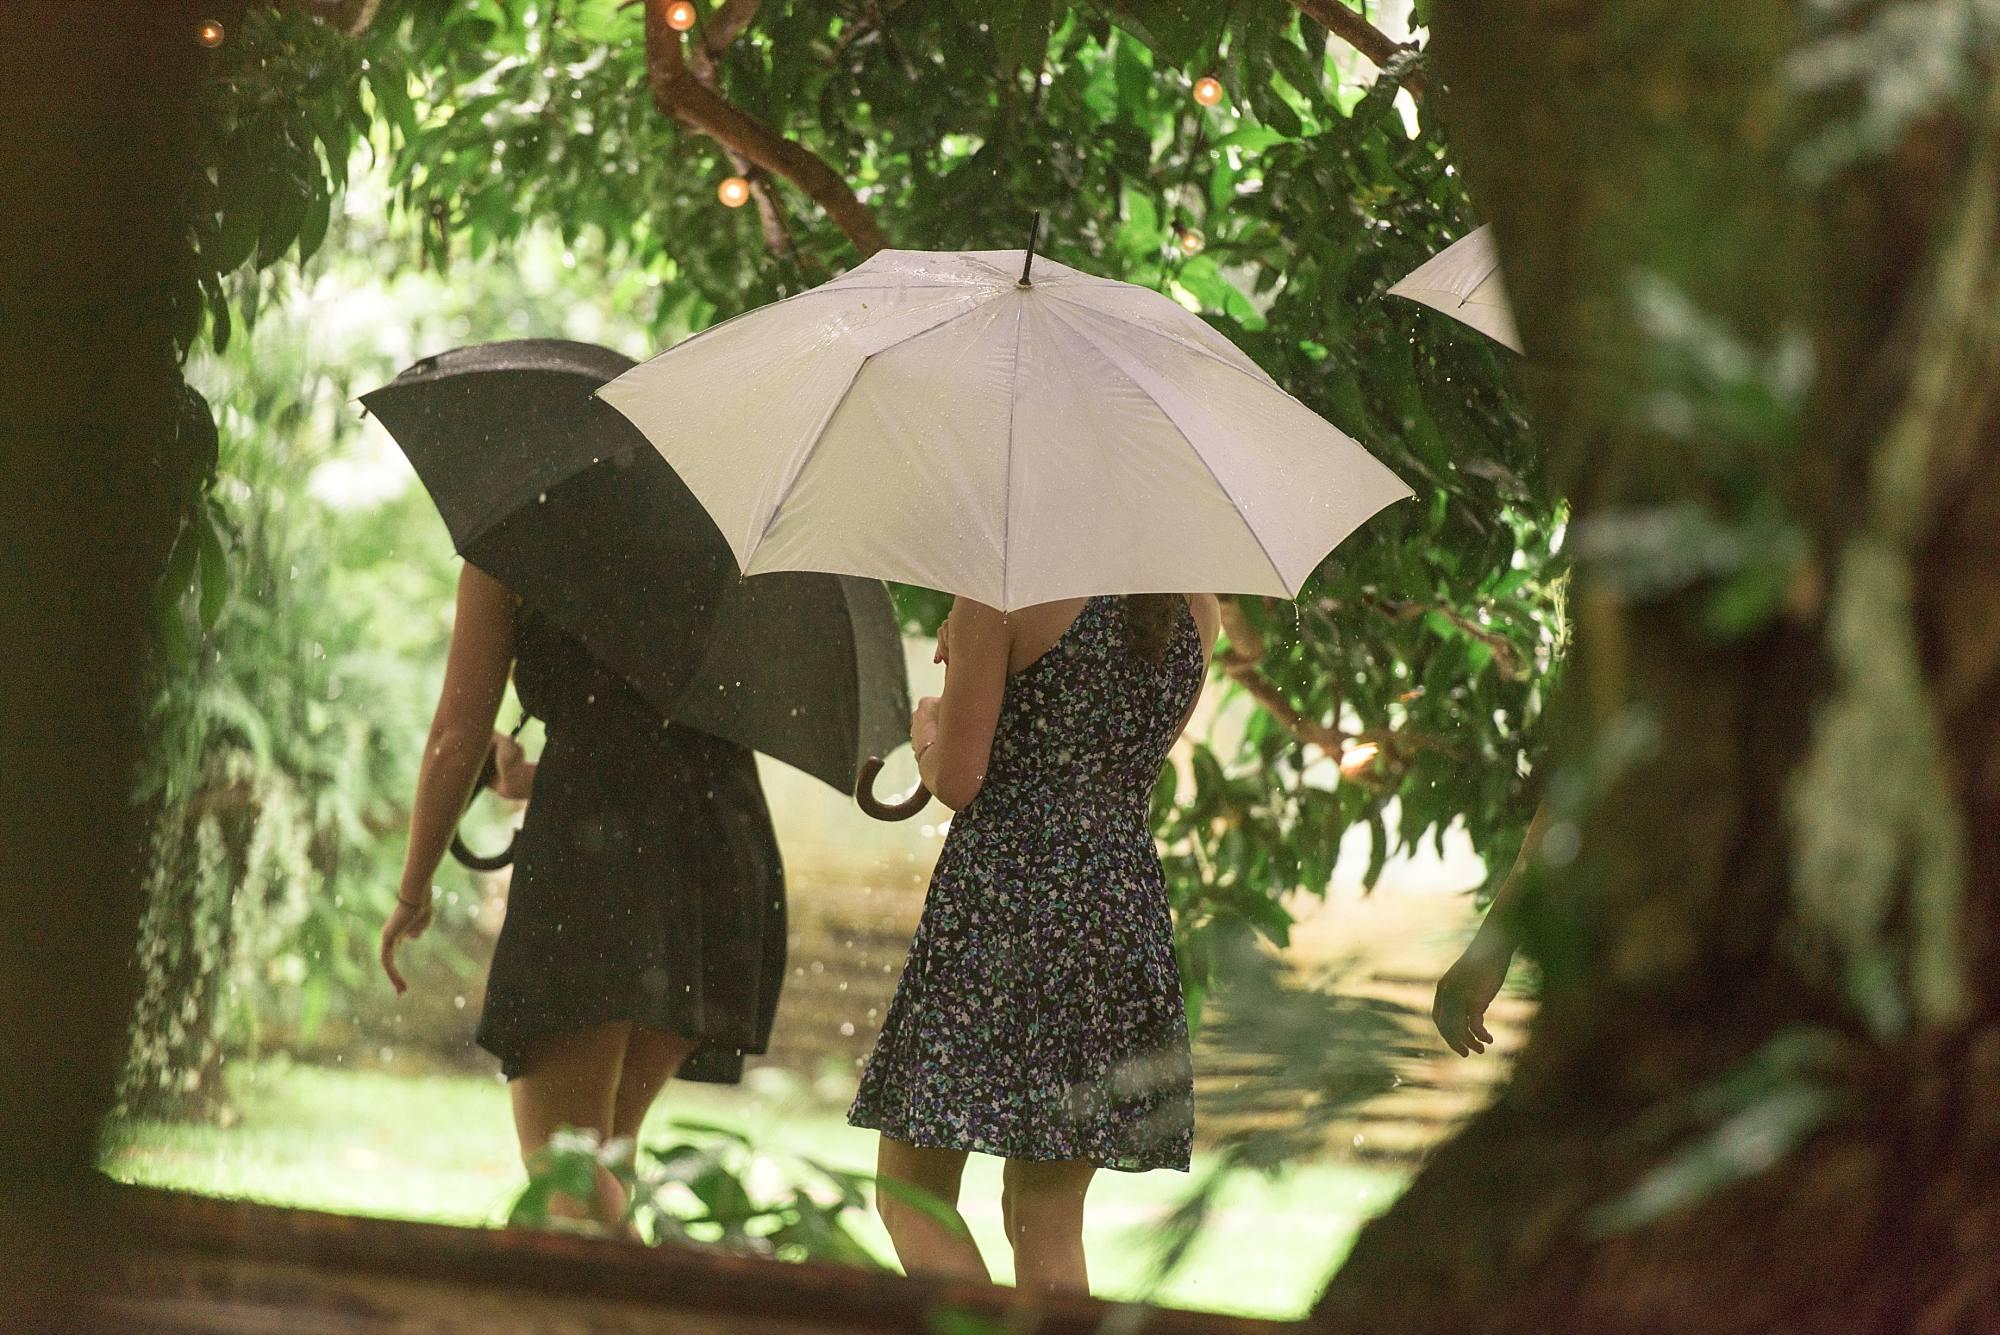 two women holding umbrellas walking away from camera, one white umbrella one black umbrella